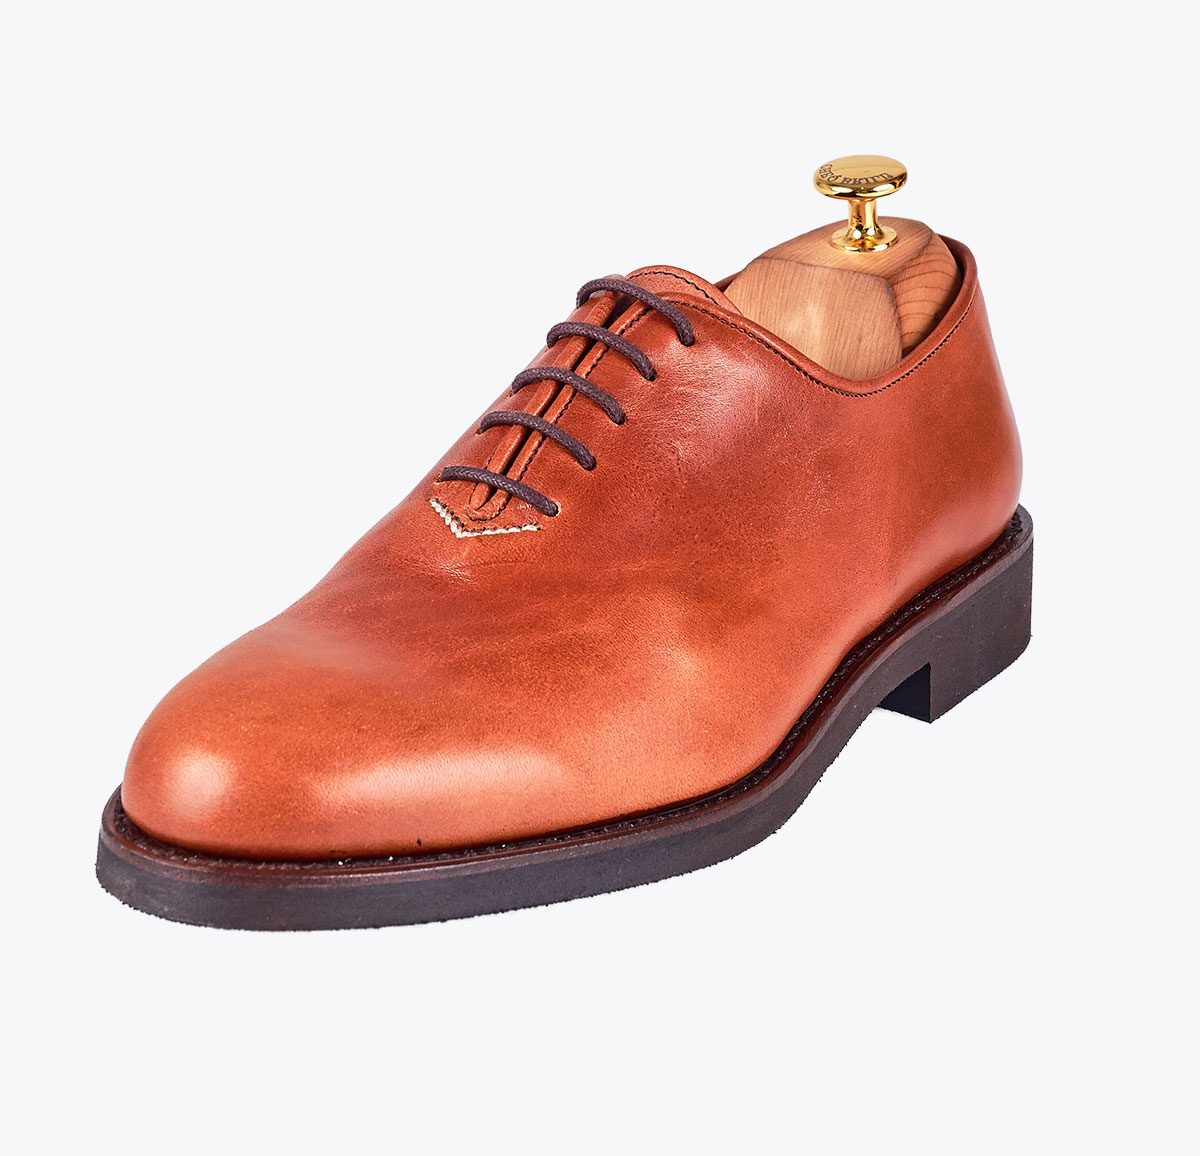 Zapato Boomerang hecho a mano en mandalashoes, Santanyí Mallorca. Hand made shoes. Nach Mass Schuhe